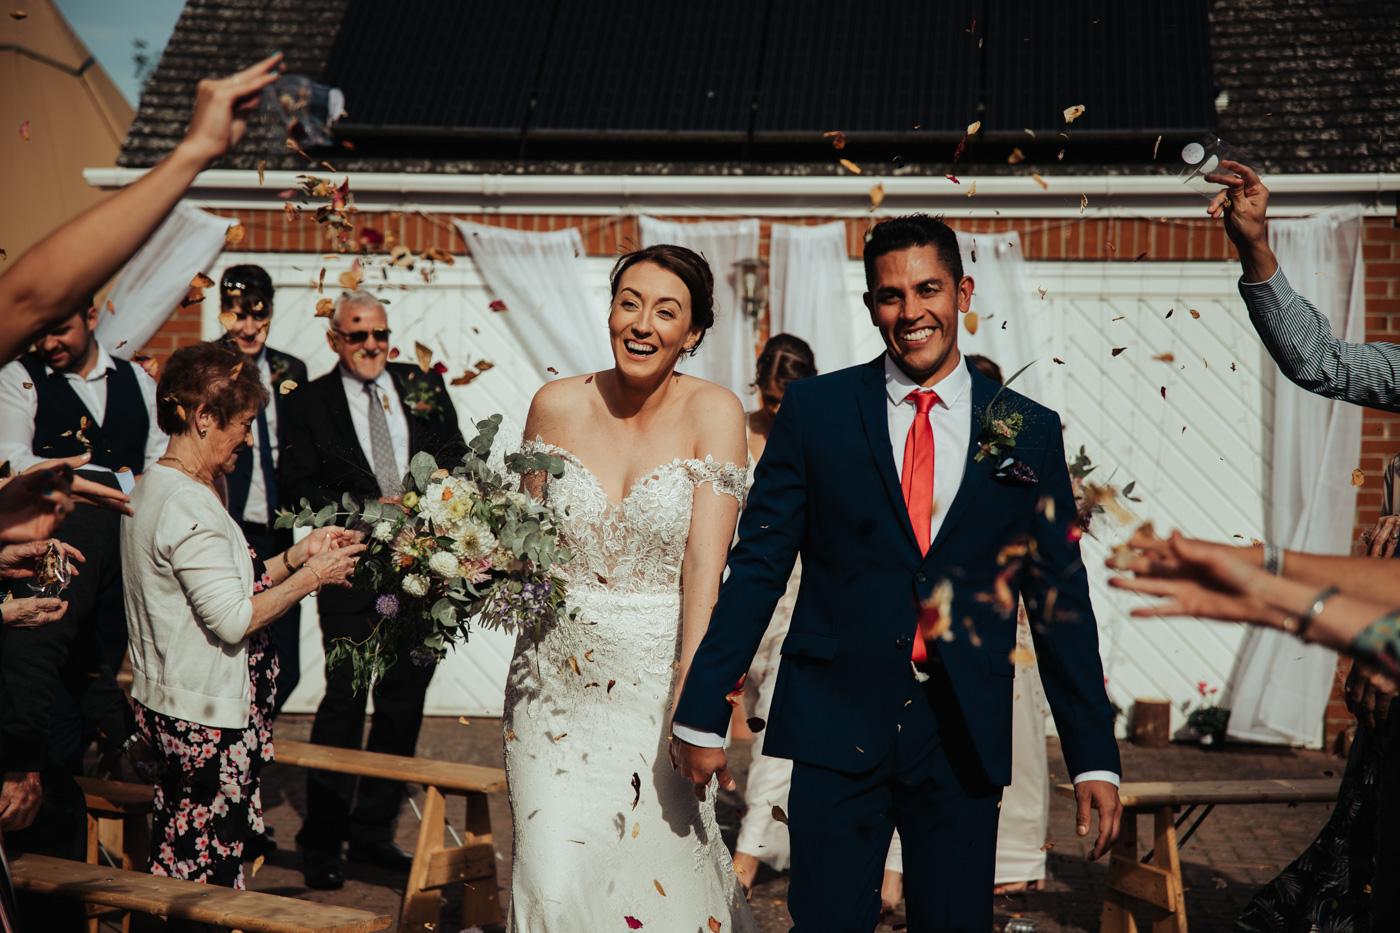 Garden wedding walking down the aisle